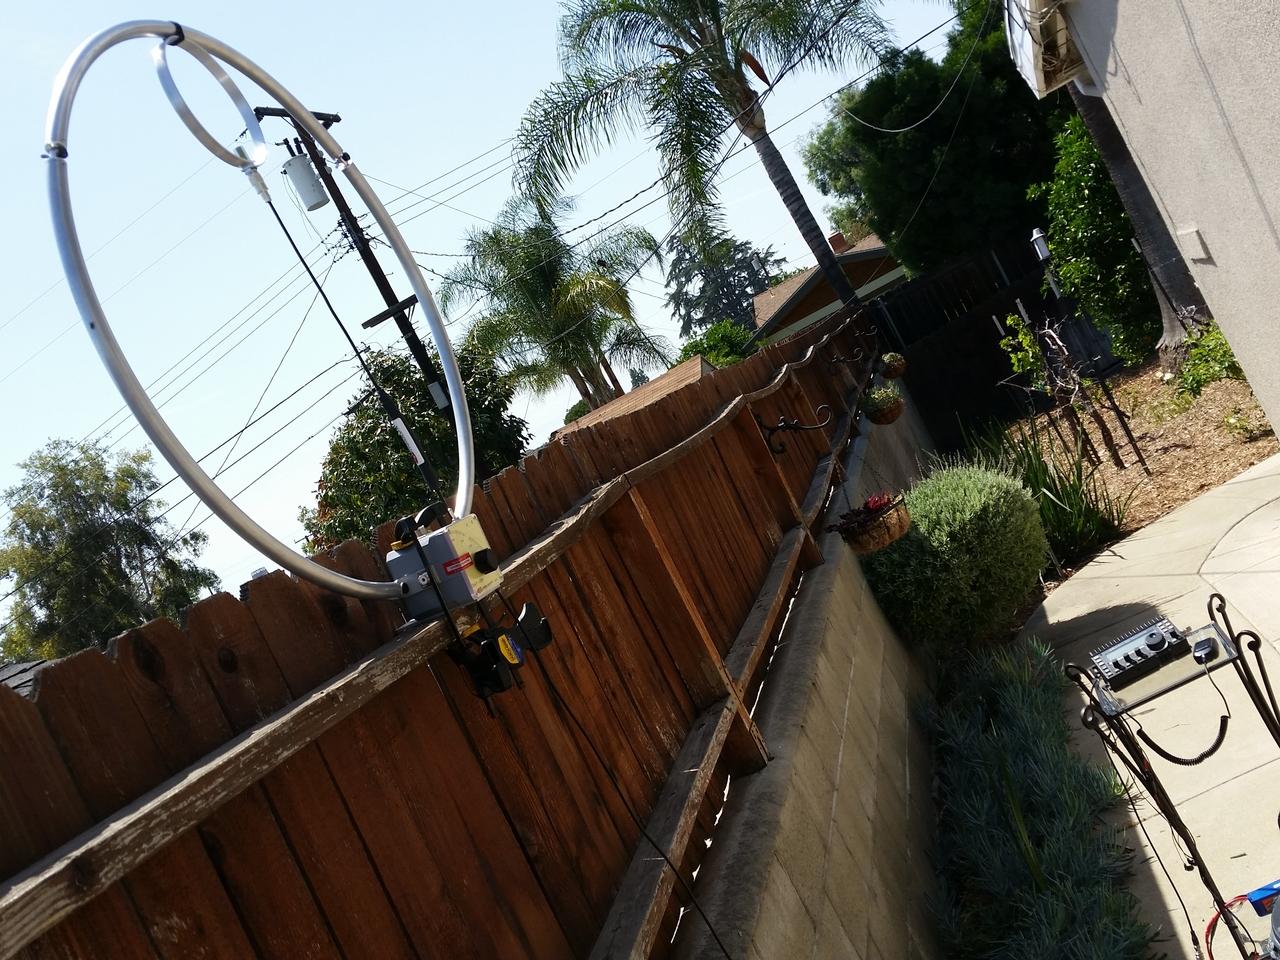 Chameleon F-loop on Fence with Elecraft KX3